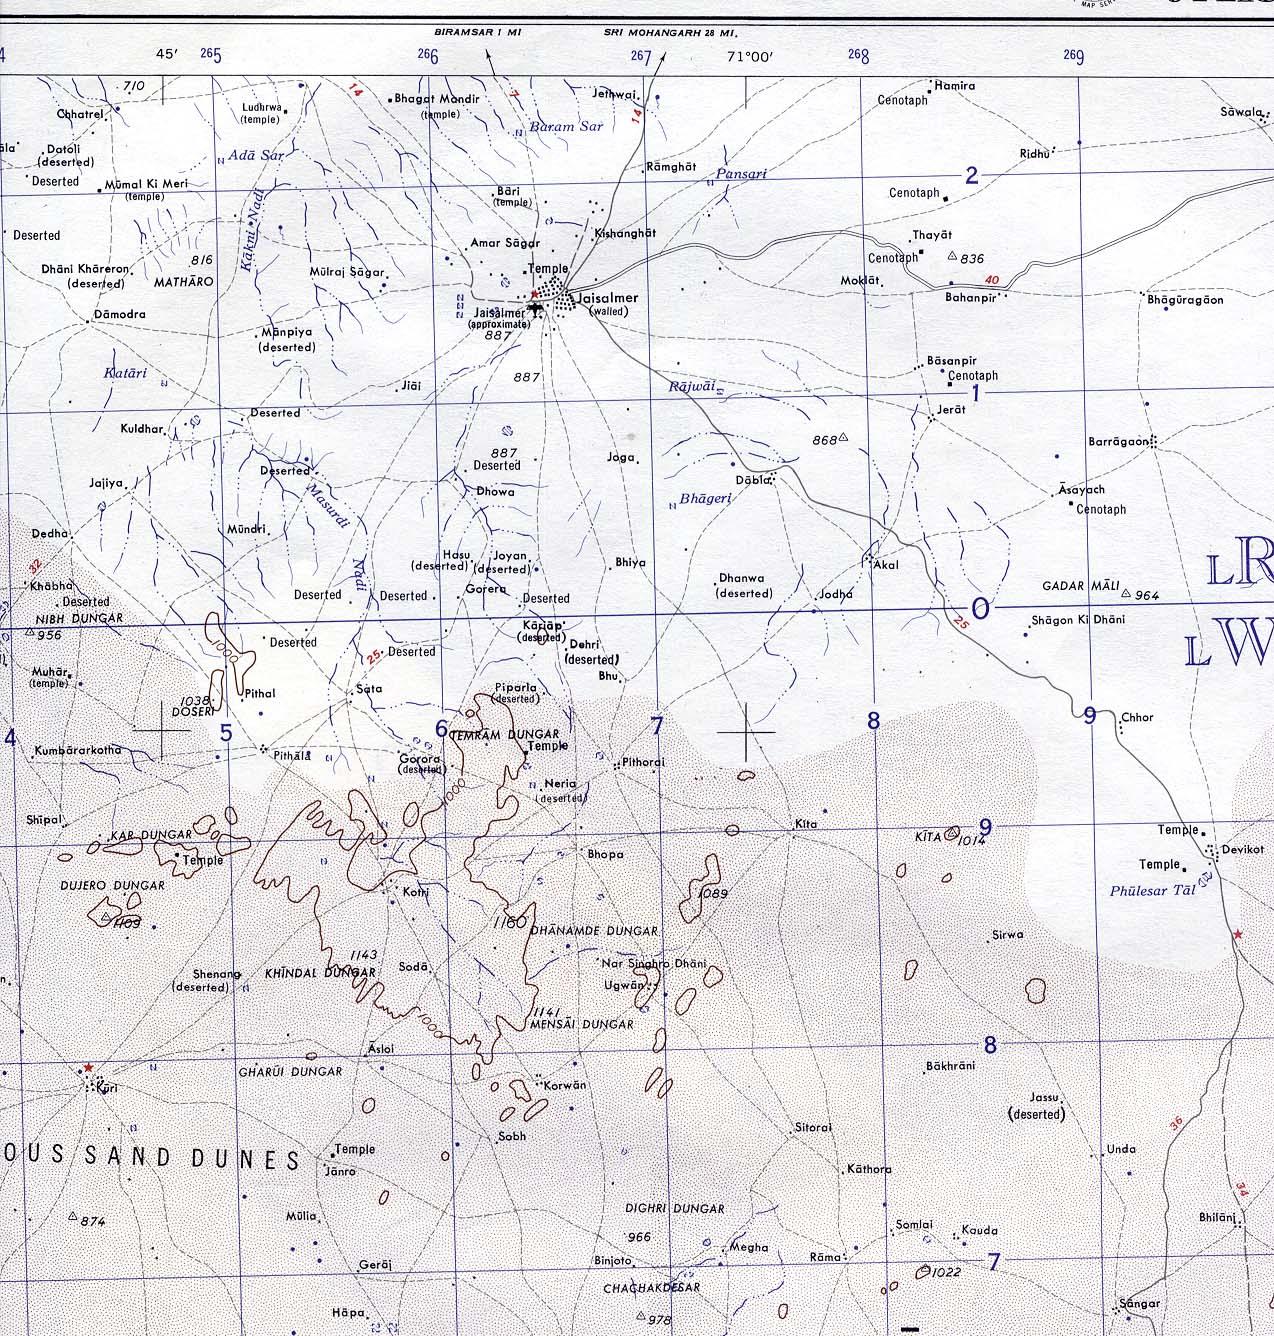 Jaisalmer Rajasthan Mapa topográfico 1959.